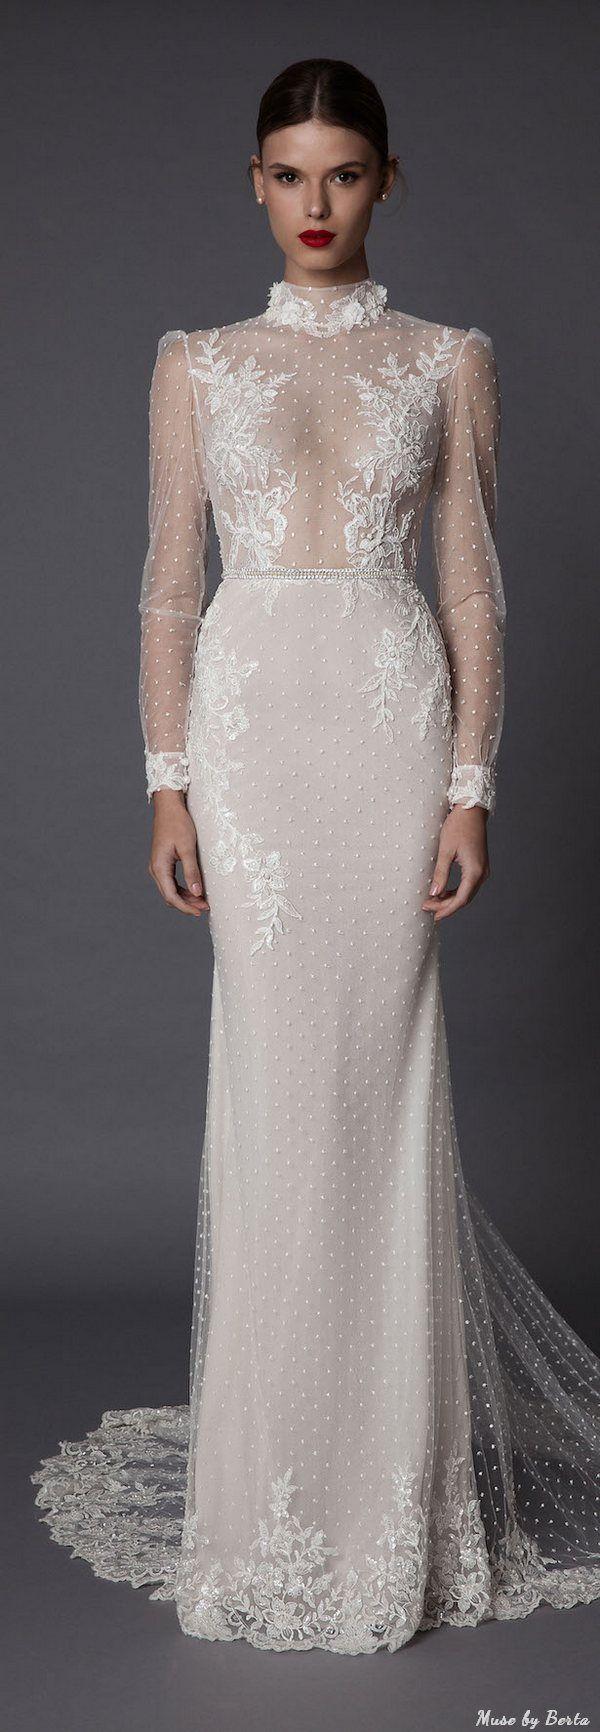 Muse by Berta Wedding Dress AMADEA 2   Deer Pearl Flowers